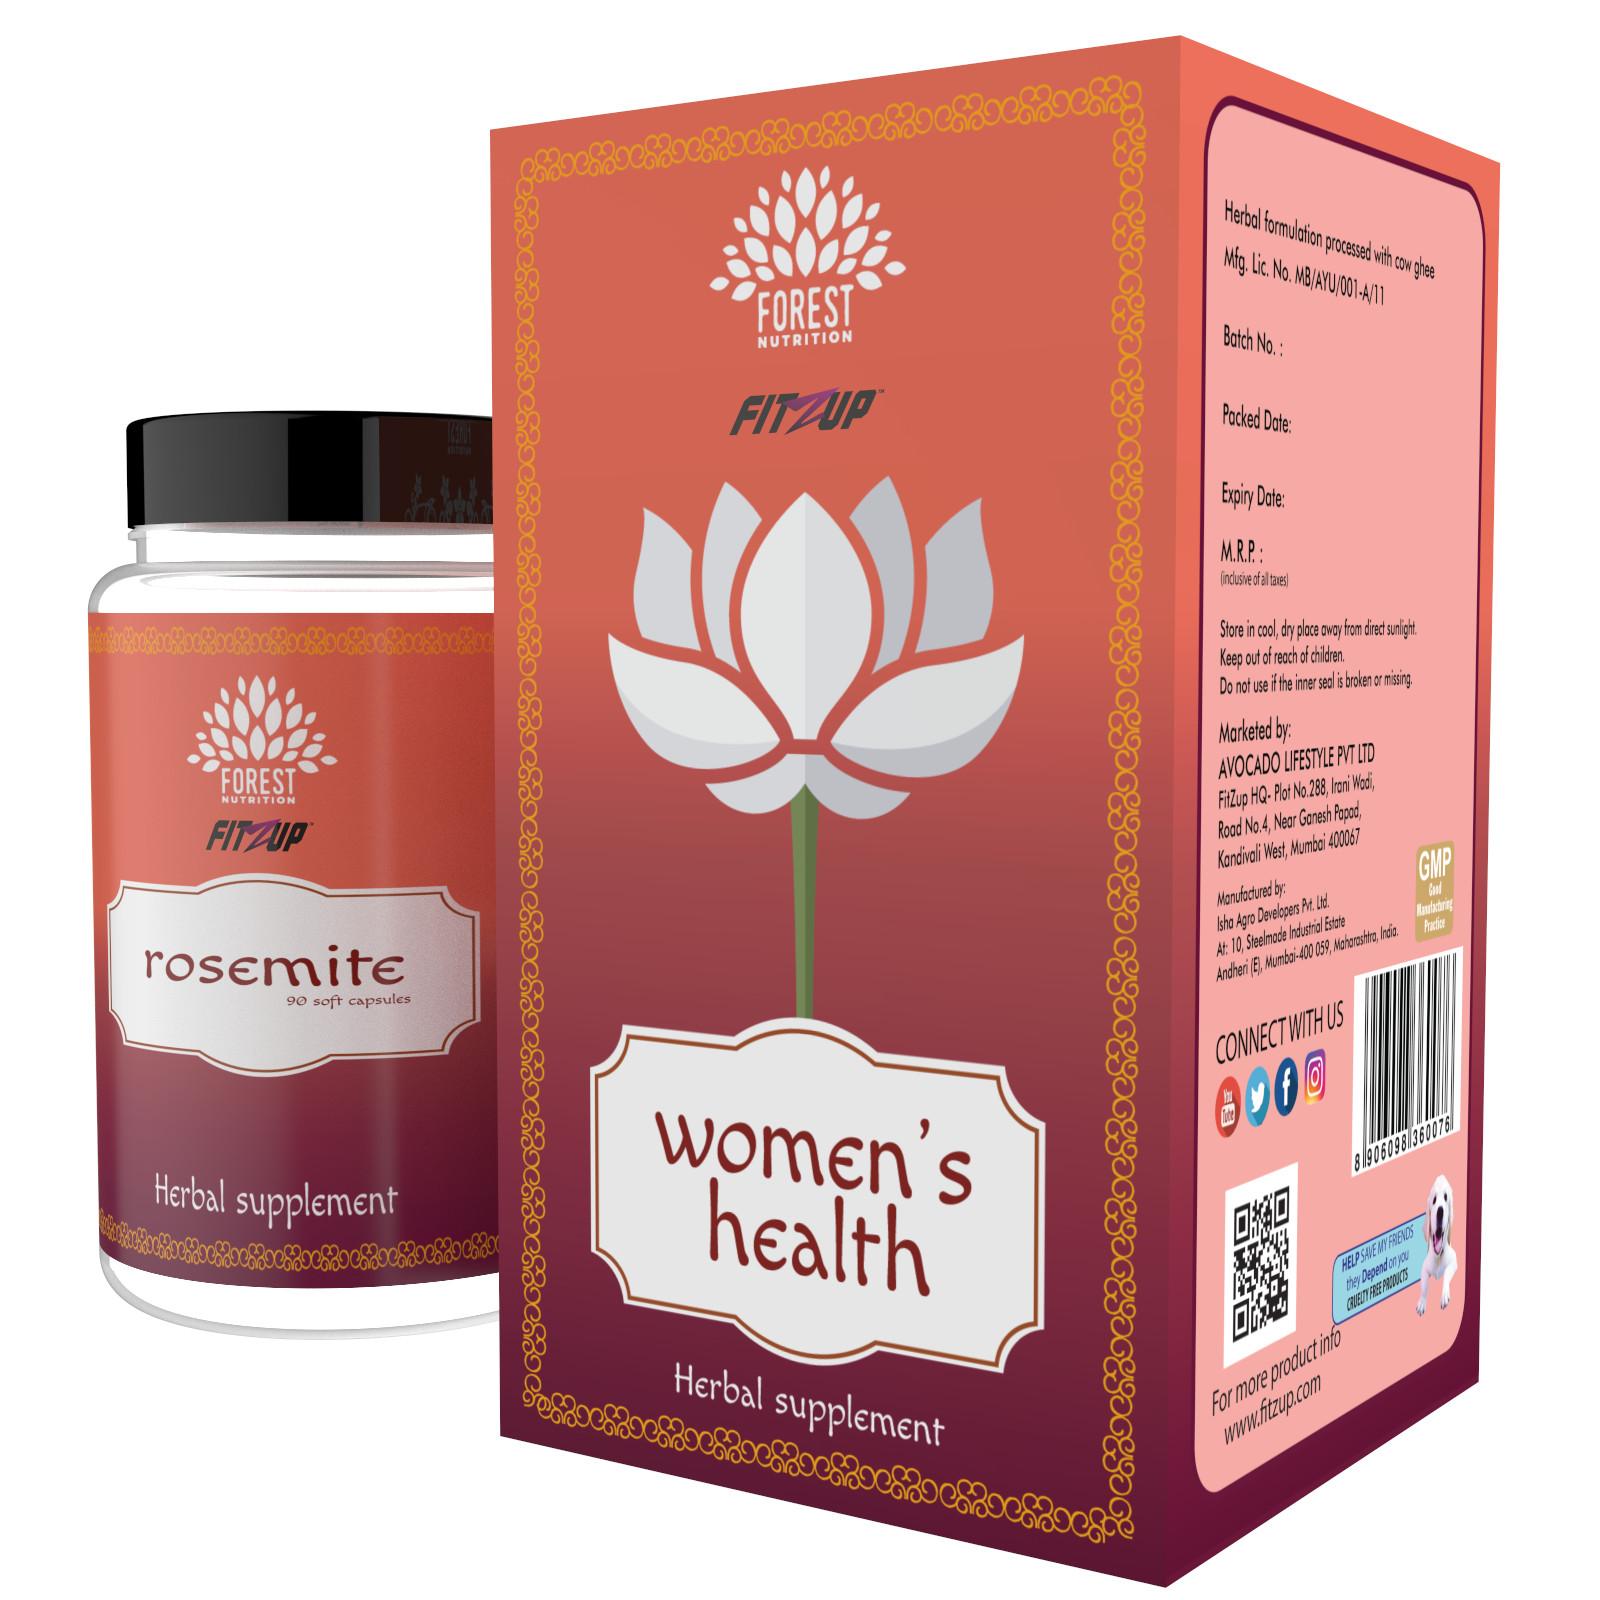 Fitzup Women s health 90 no s Vitamins Capsule